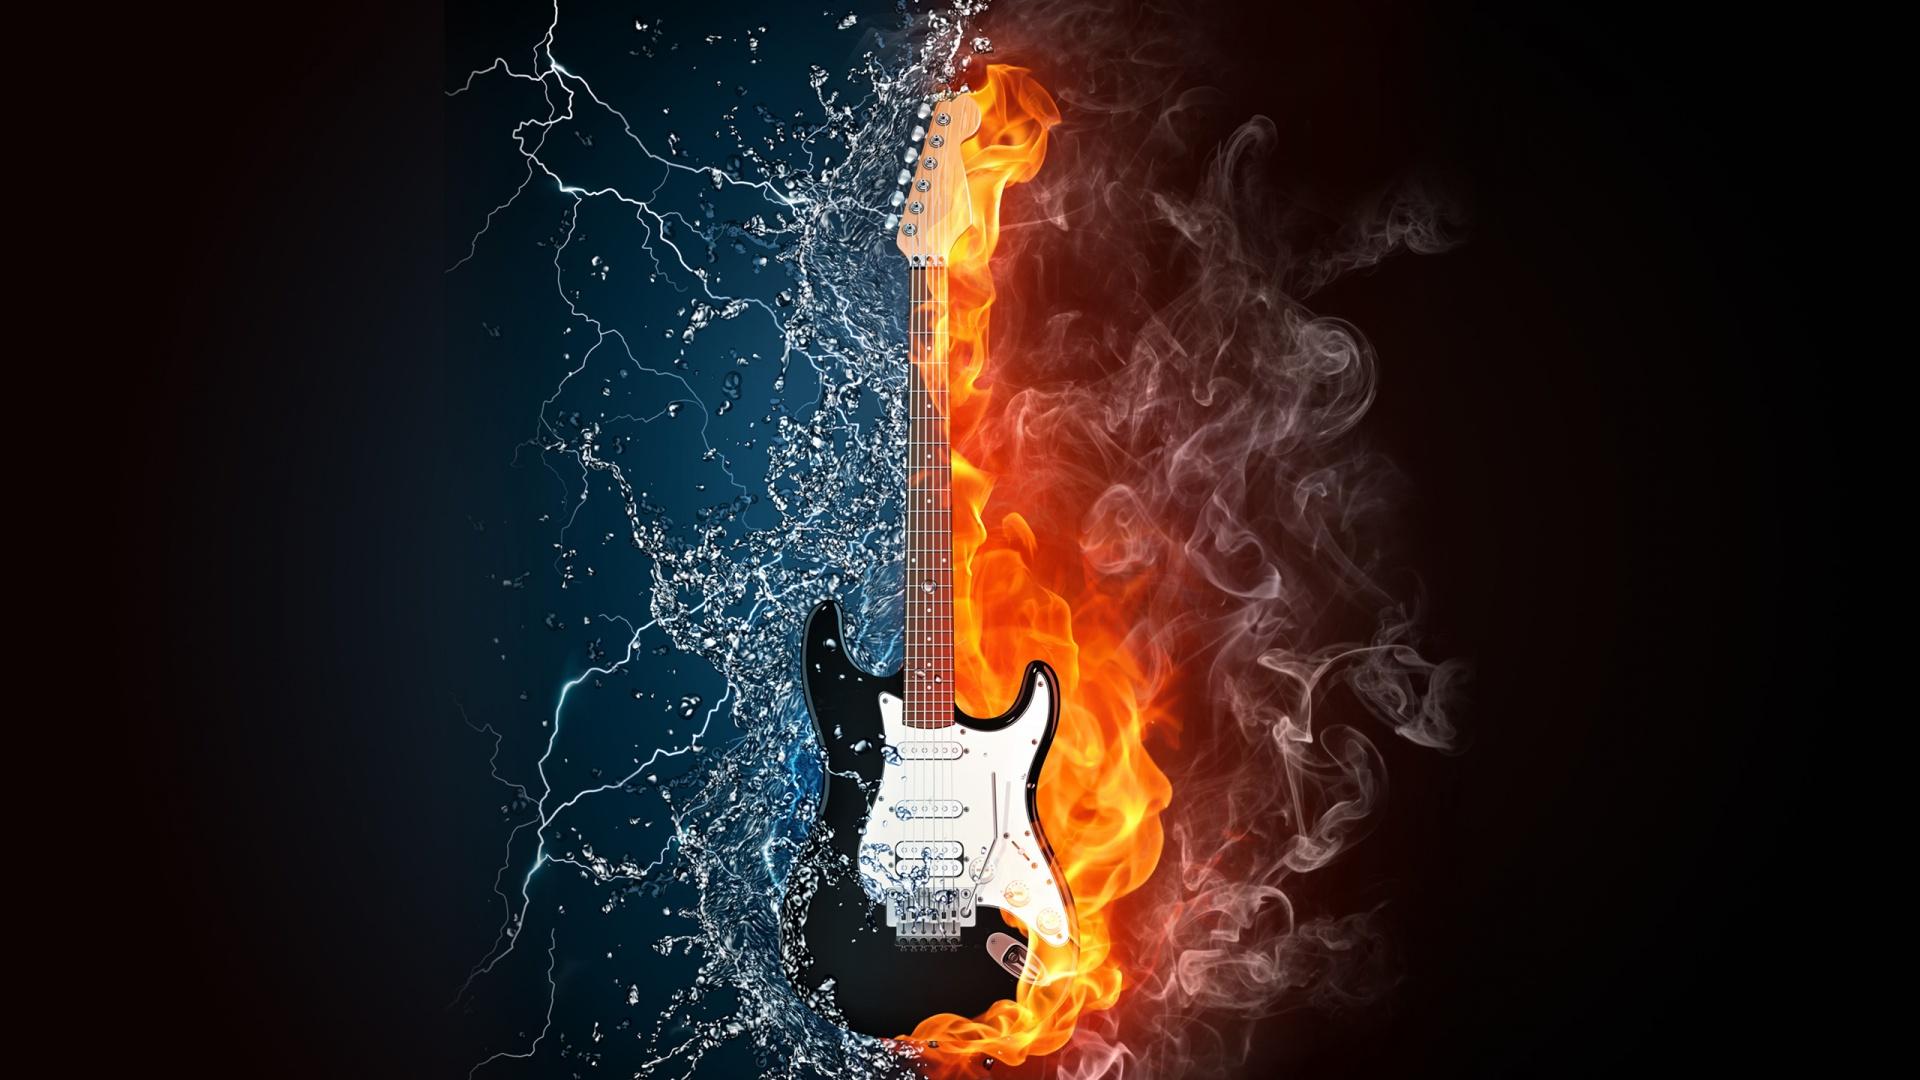 cool fire wallpapers – wallpapermonkey com